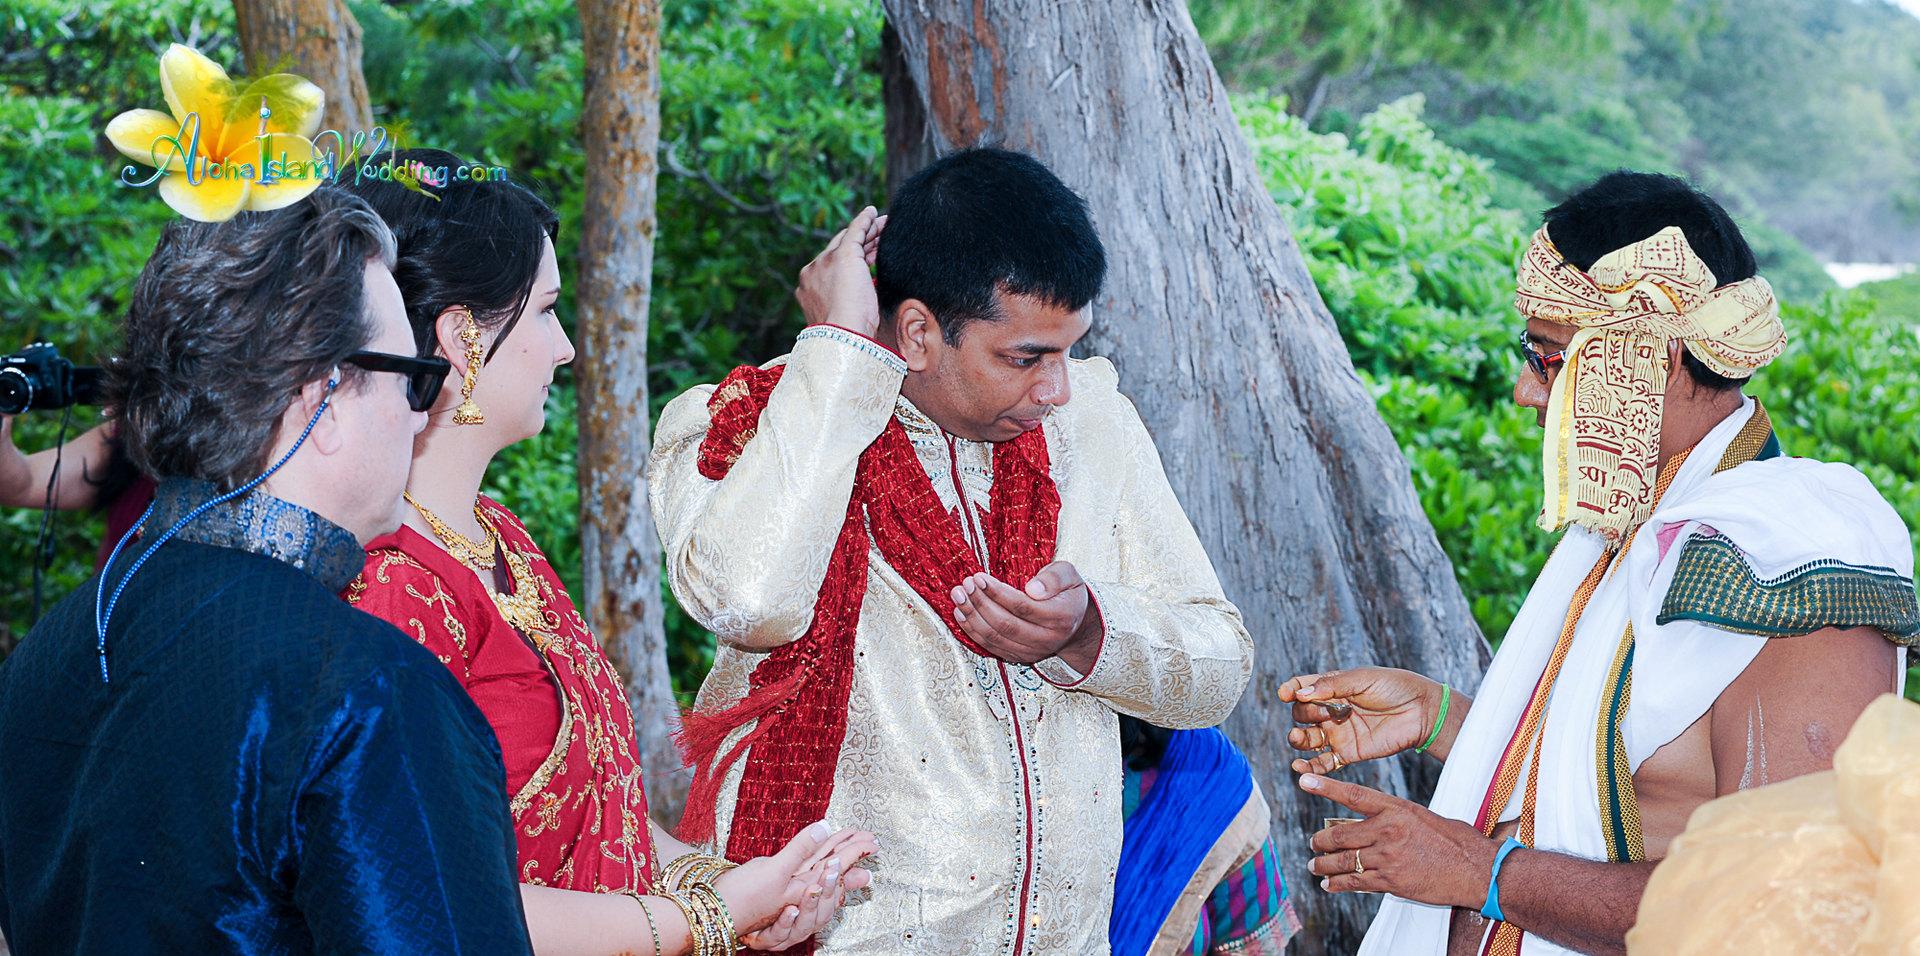 Indian wedding ceremony in hawaii-74.jpg